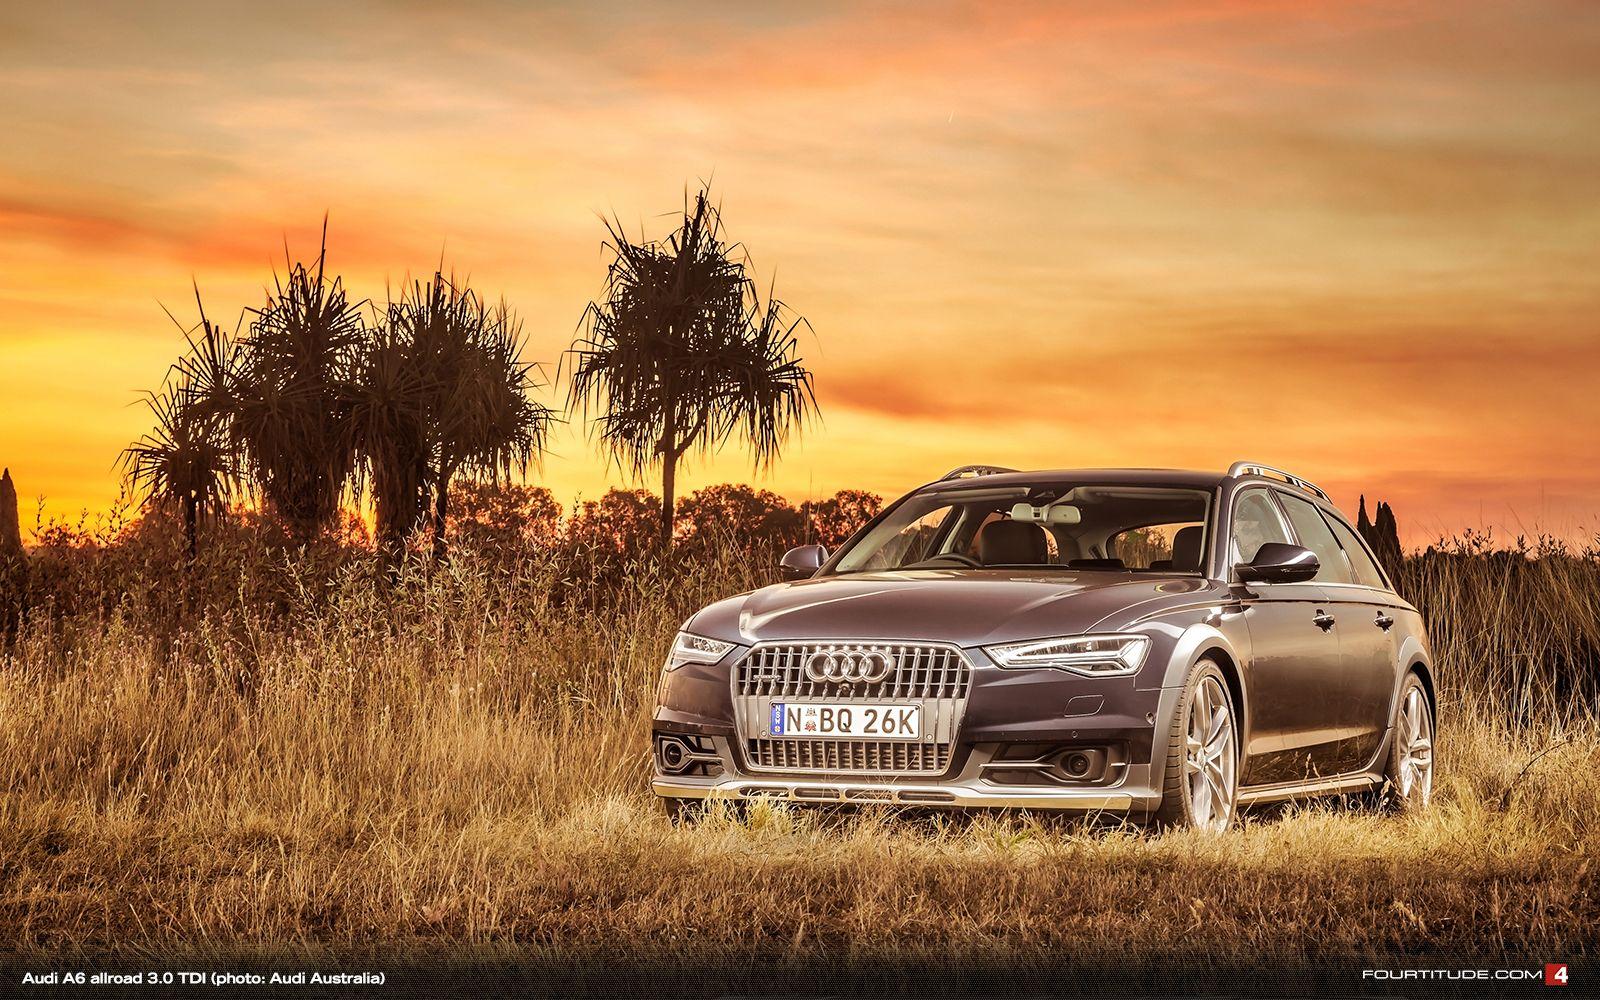 New Audi A6 Allroad Traumauto Autos